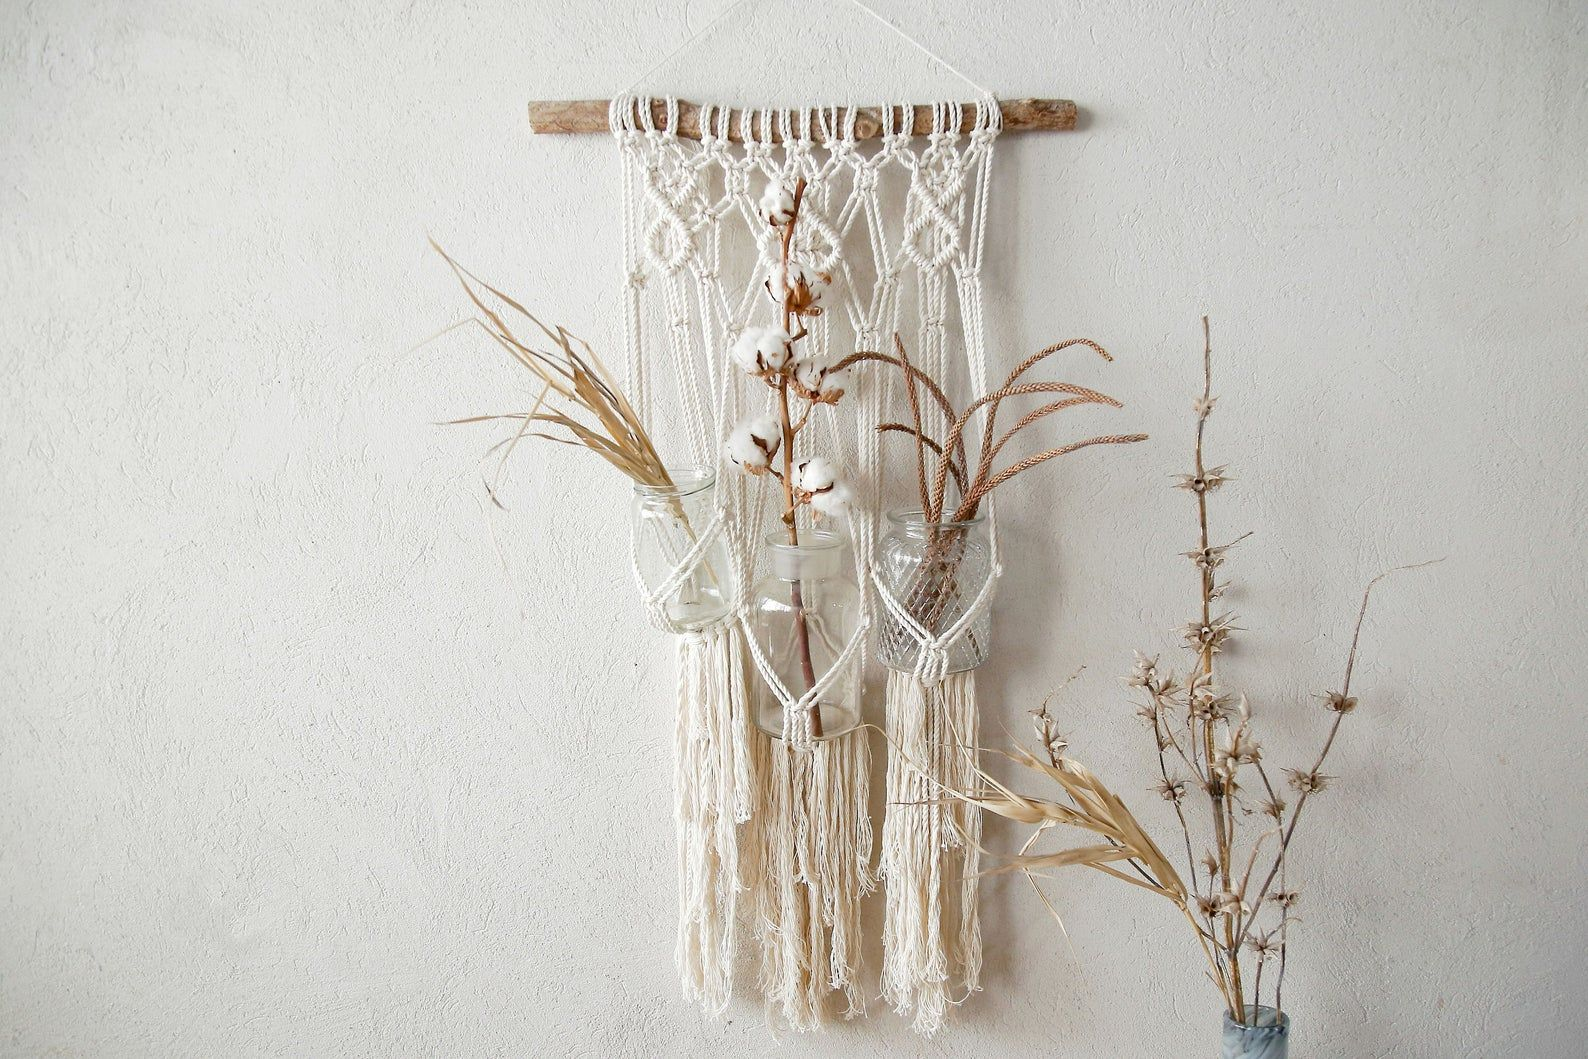 Macrame trio plant hanger by Nomamacrame